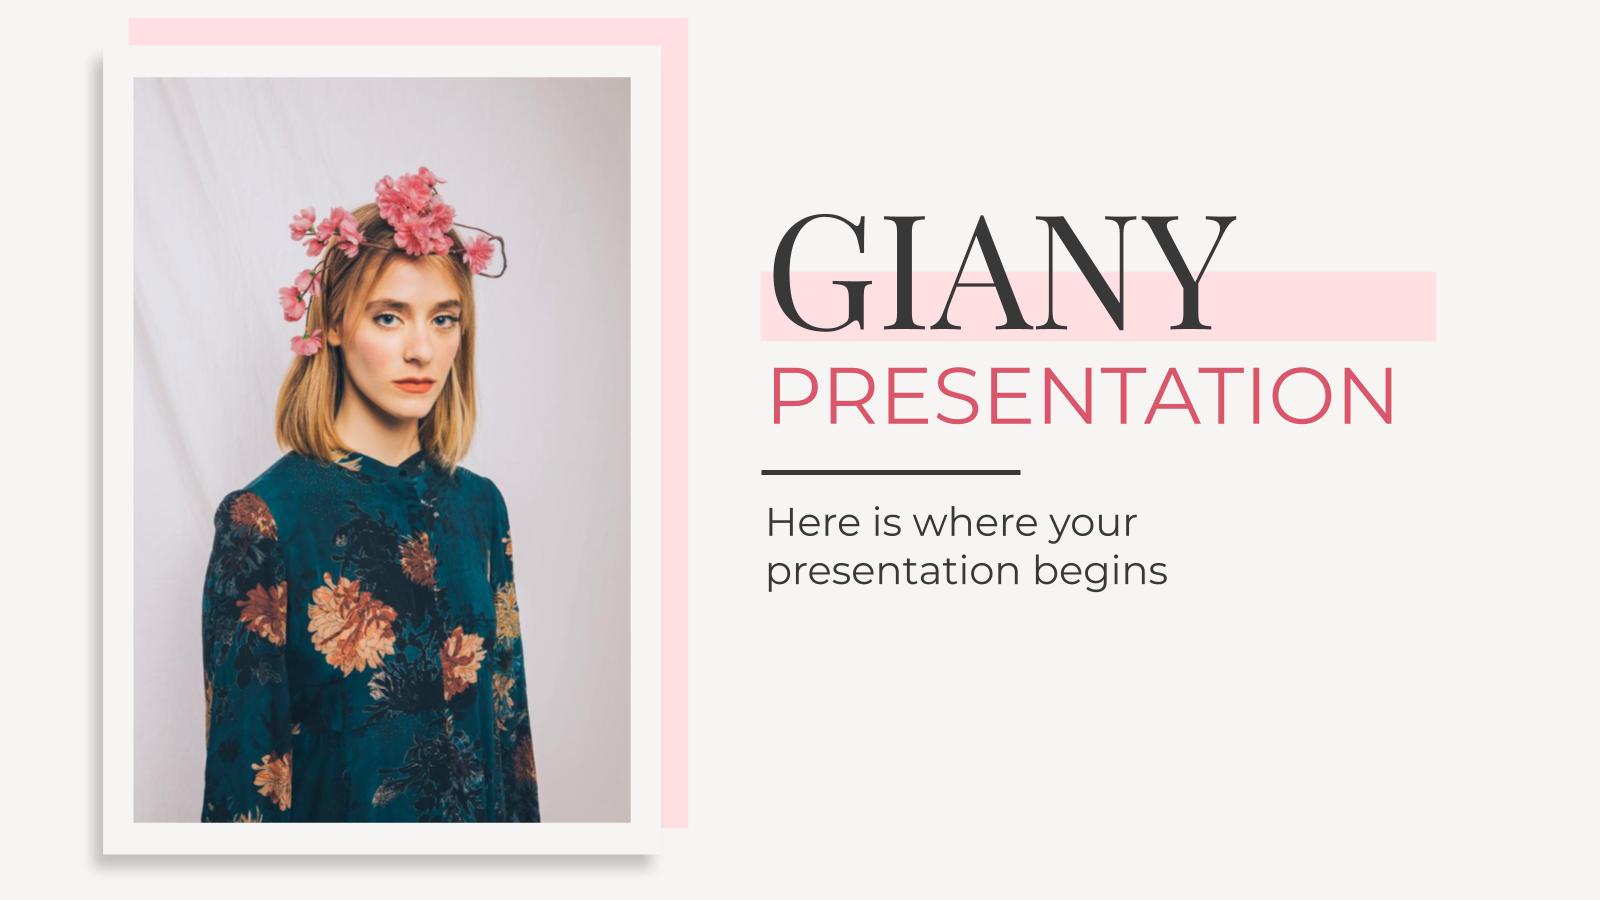 Plantilla de presentación Giany